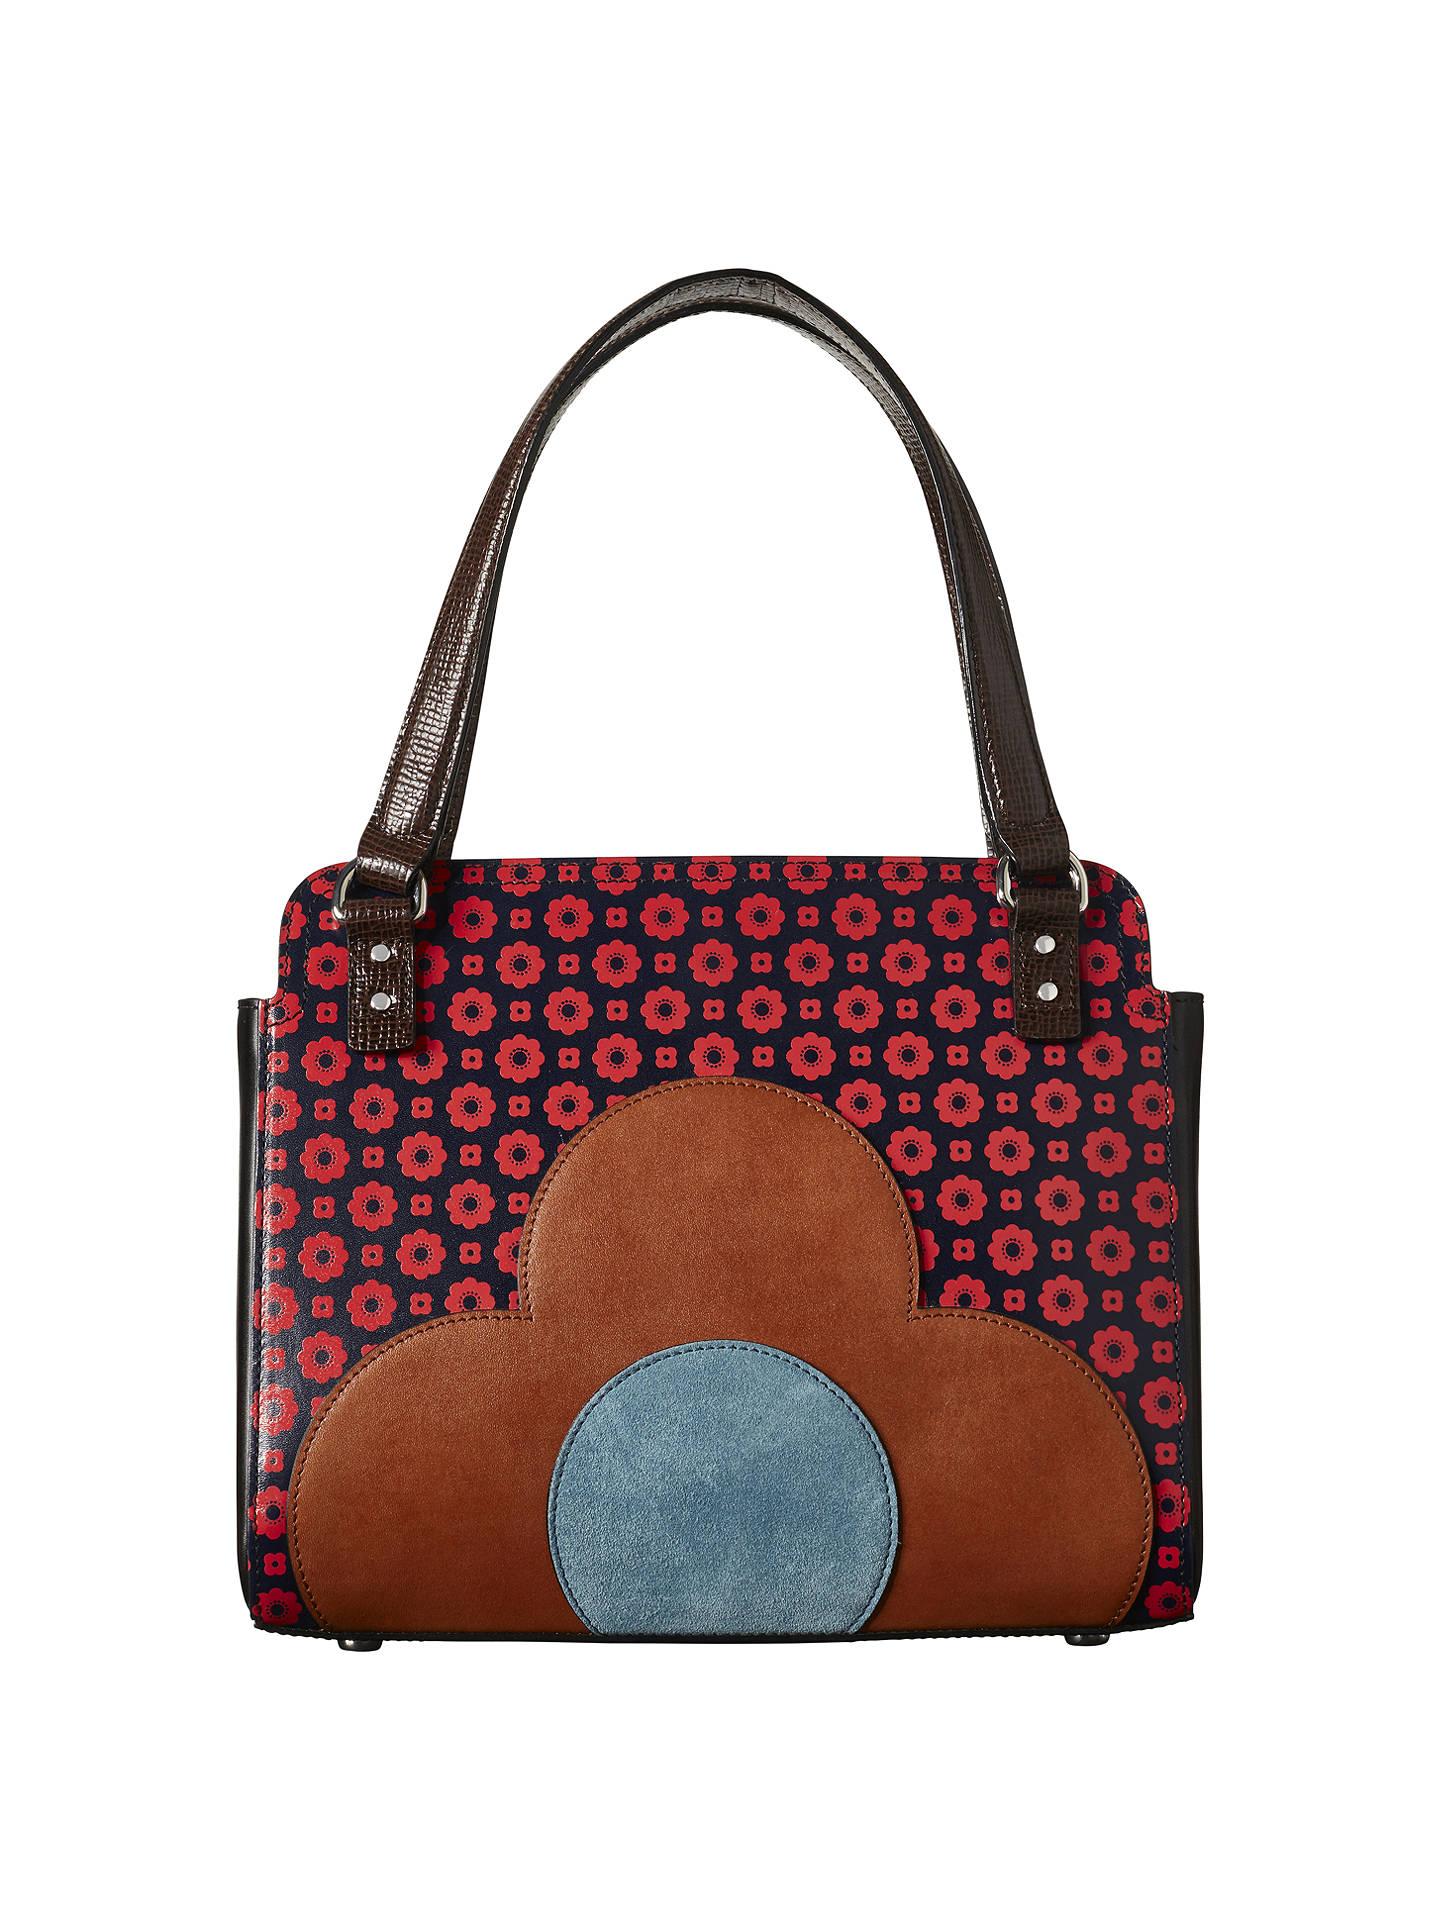 Orla Kiely Jeanette Leather Flower Foulard Bowler Bag Multi Online At Johnlewis